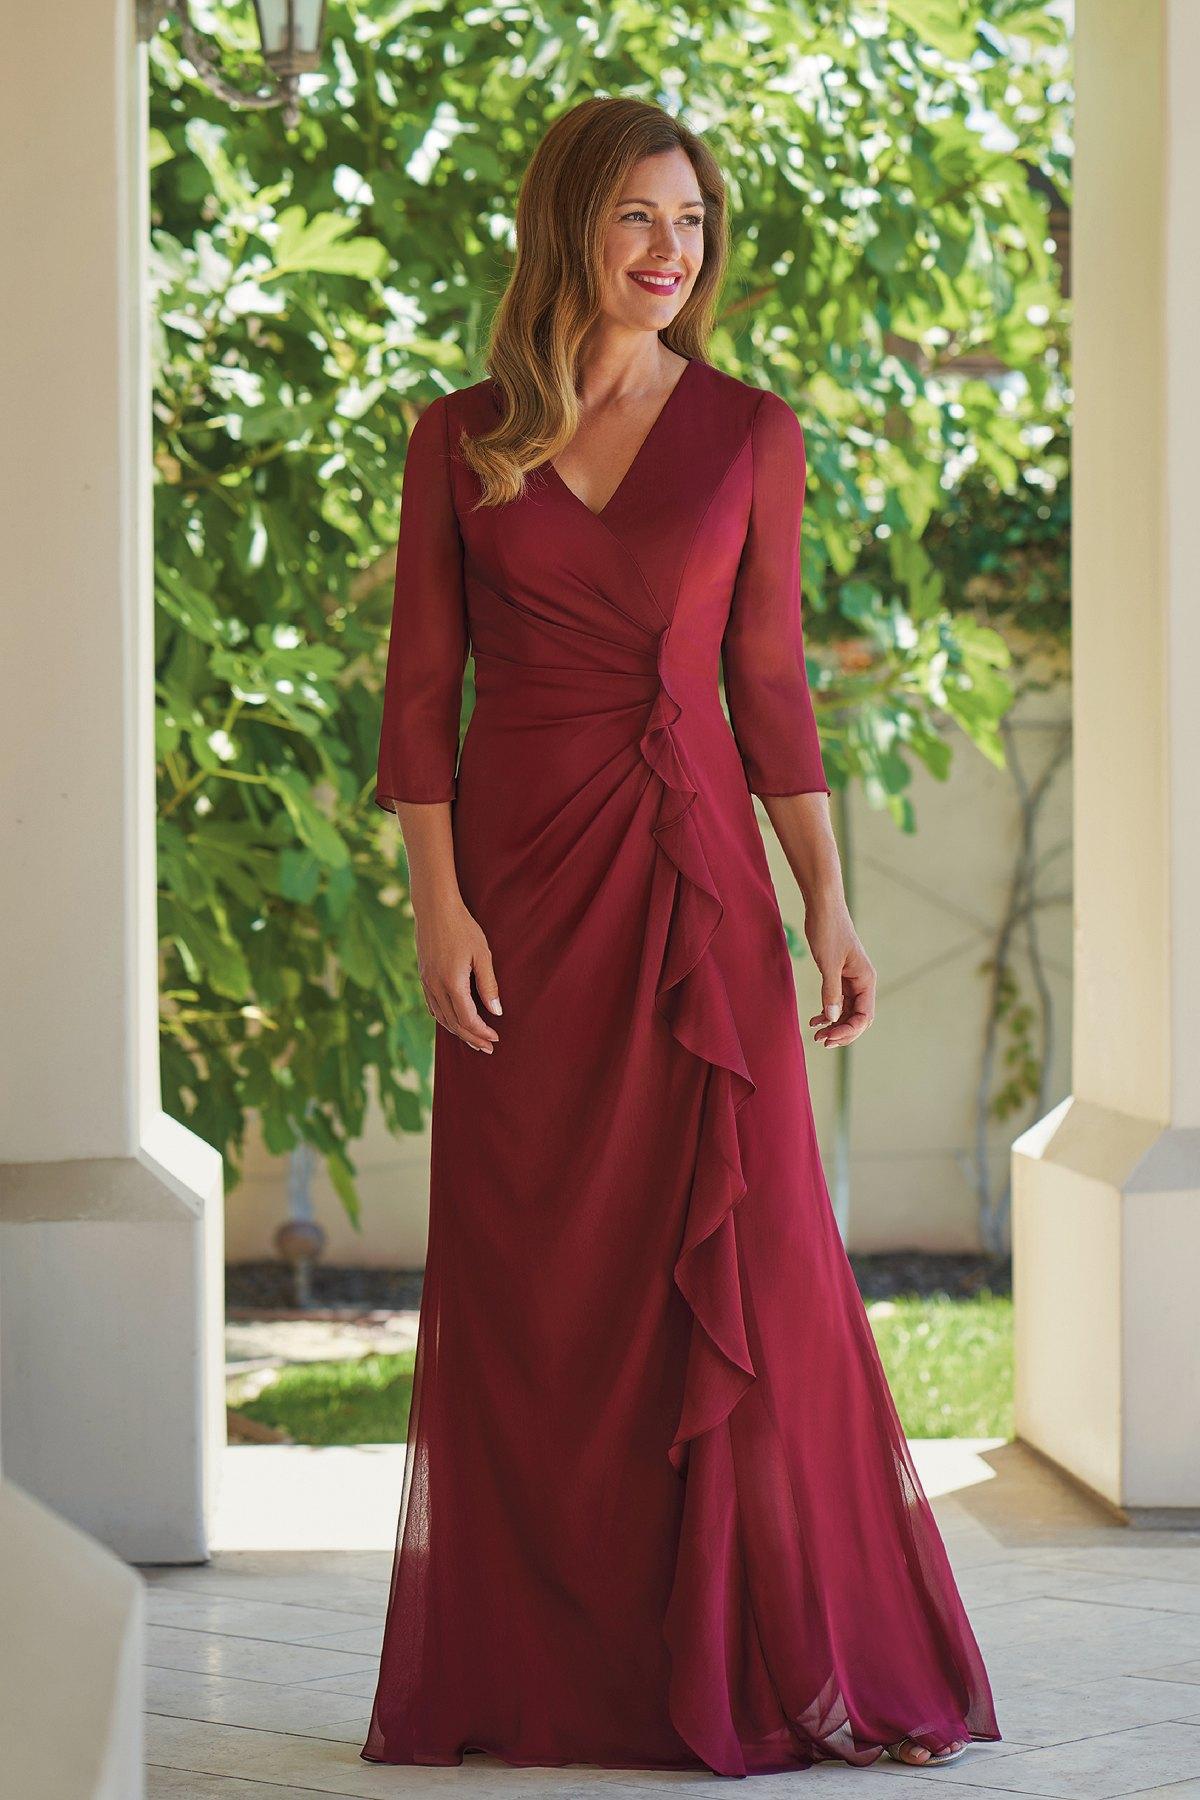 49420860570 J215005U Jade Tiffany Chiffon MOB Dress with V-Neckline